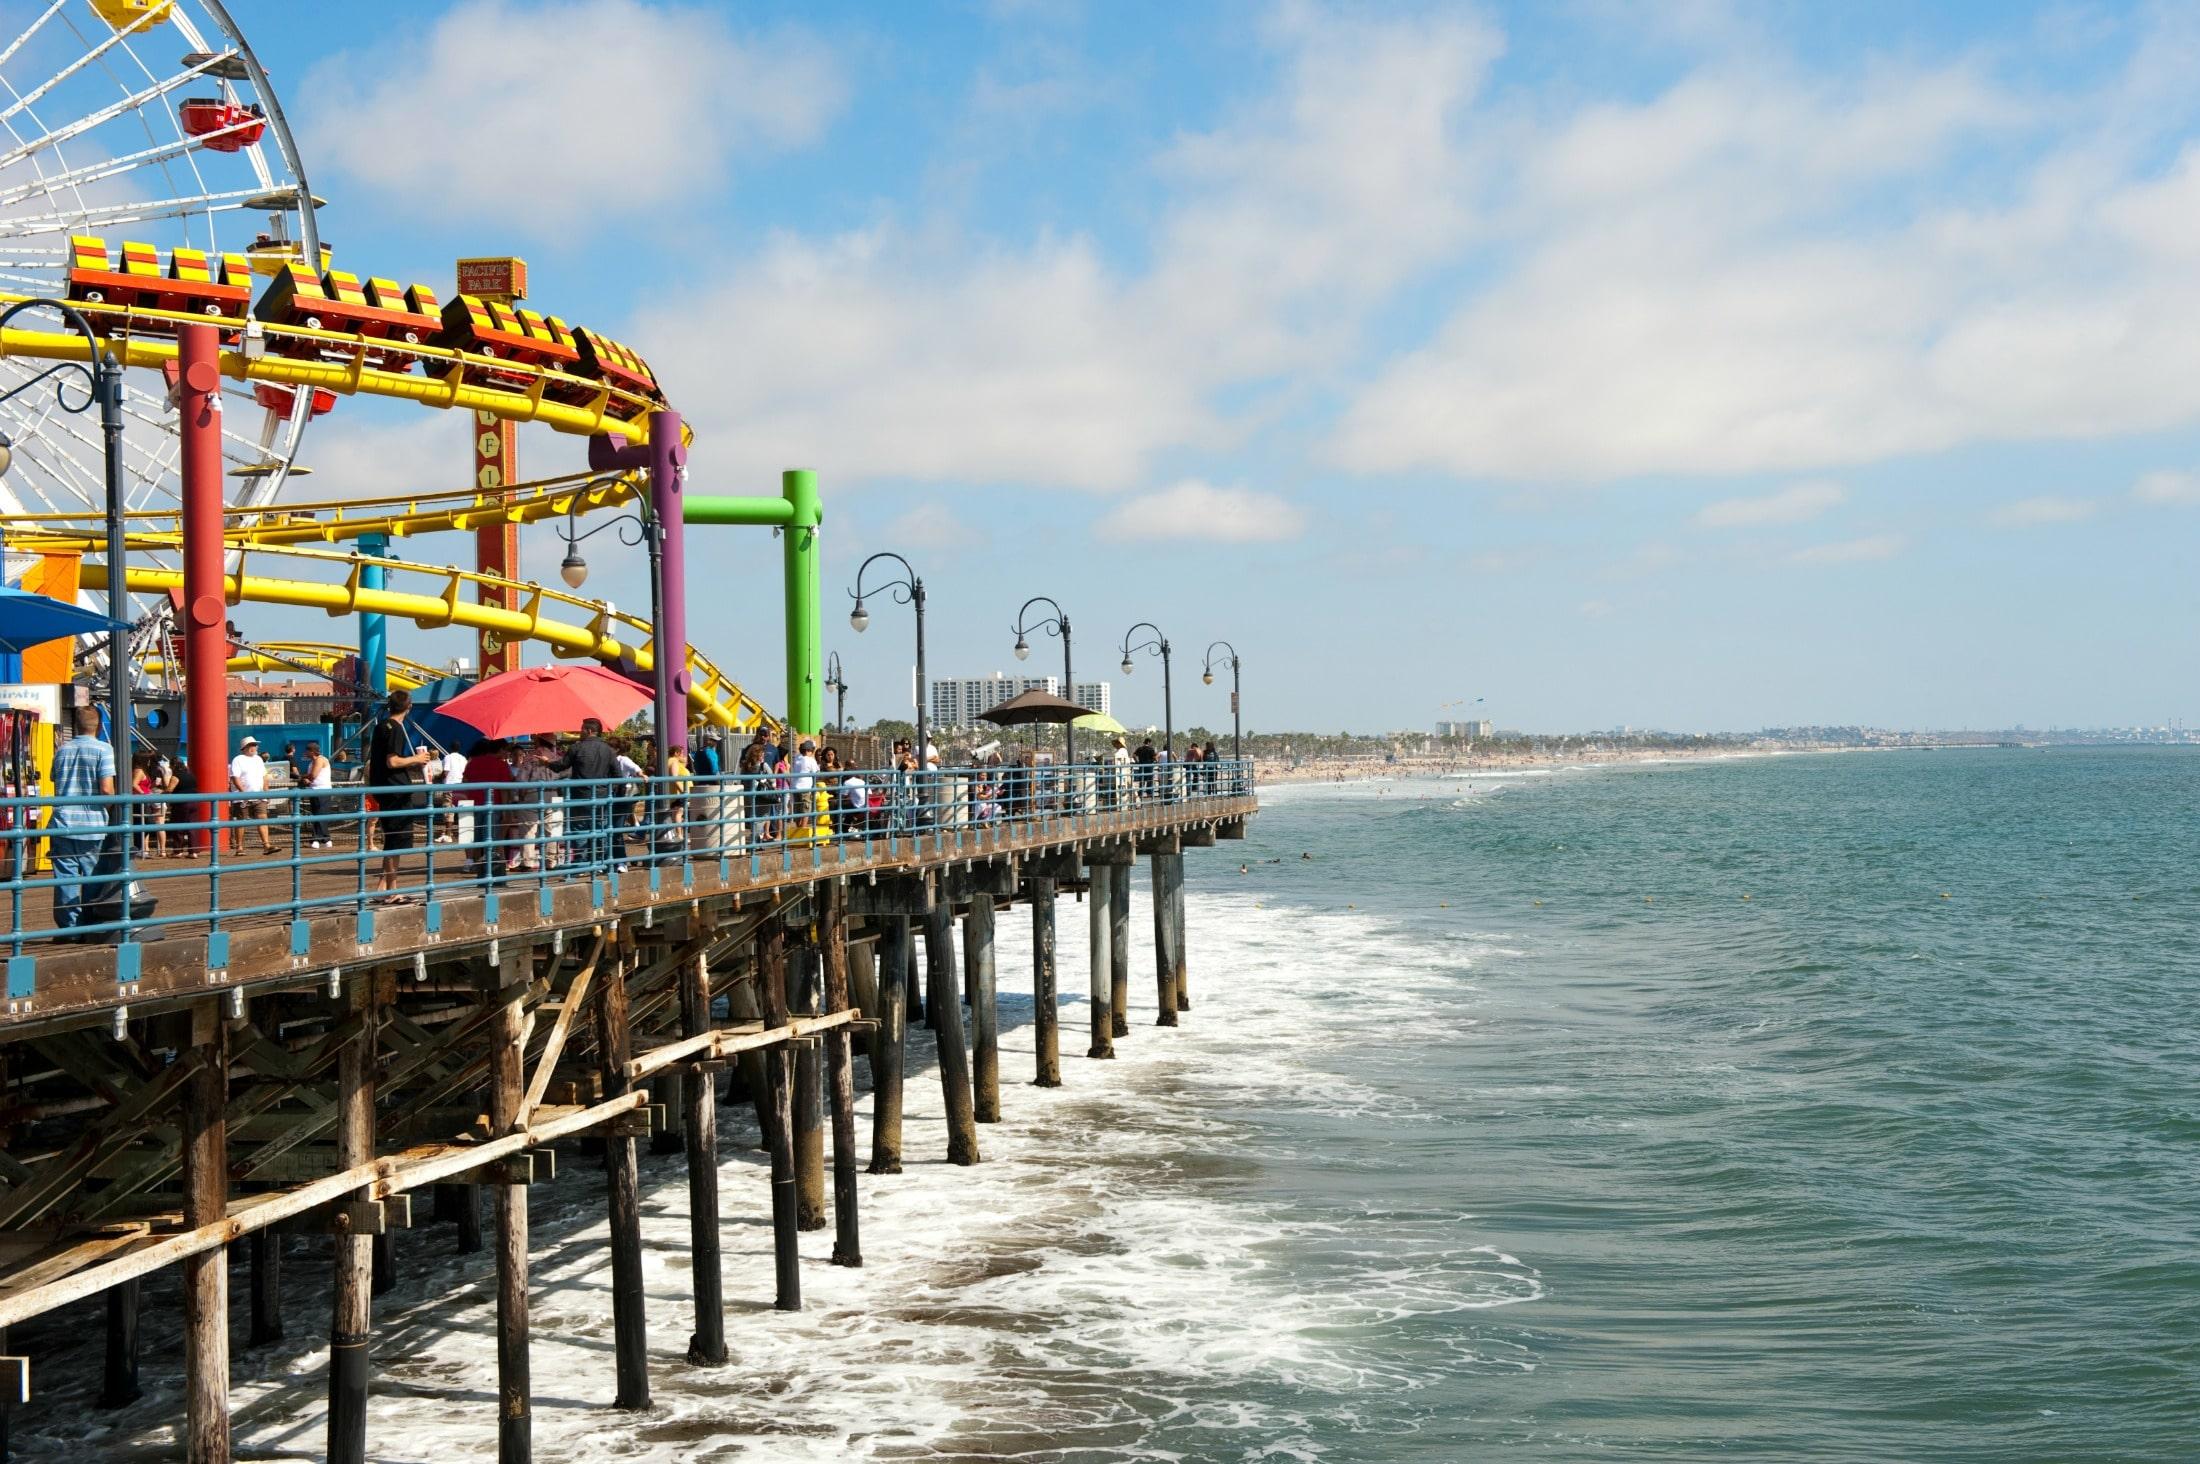 Many family vacations in California happen in Santa Monica on the beach